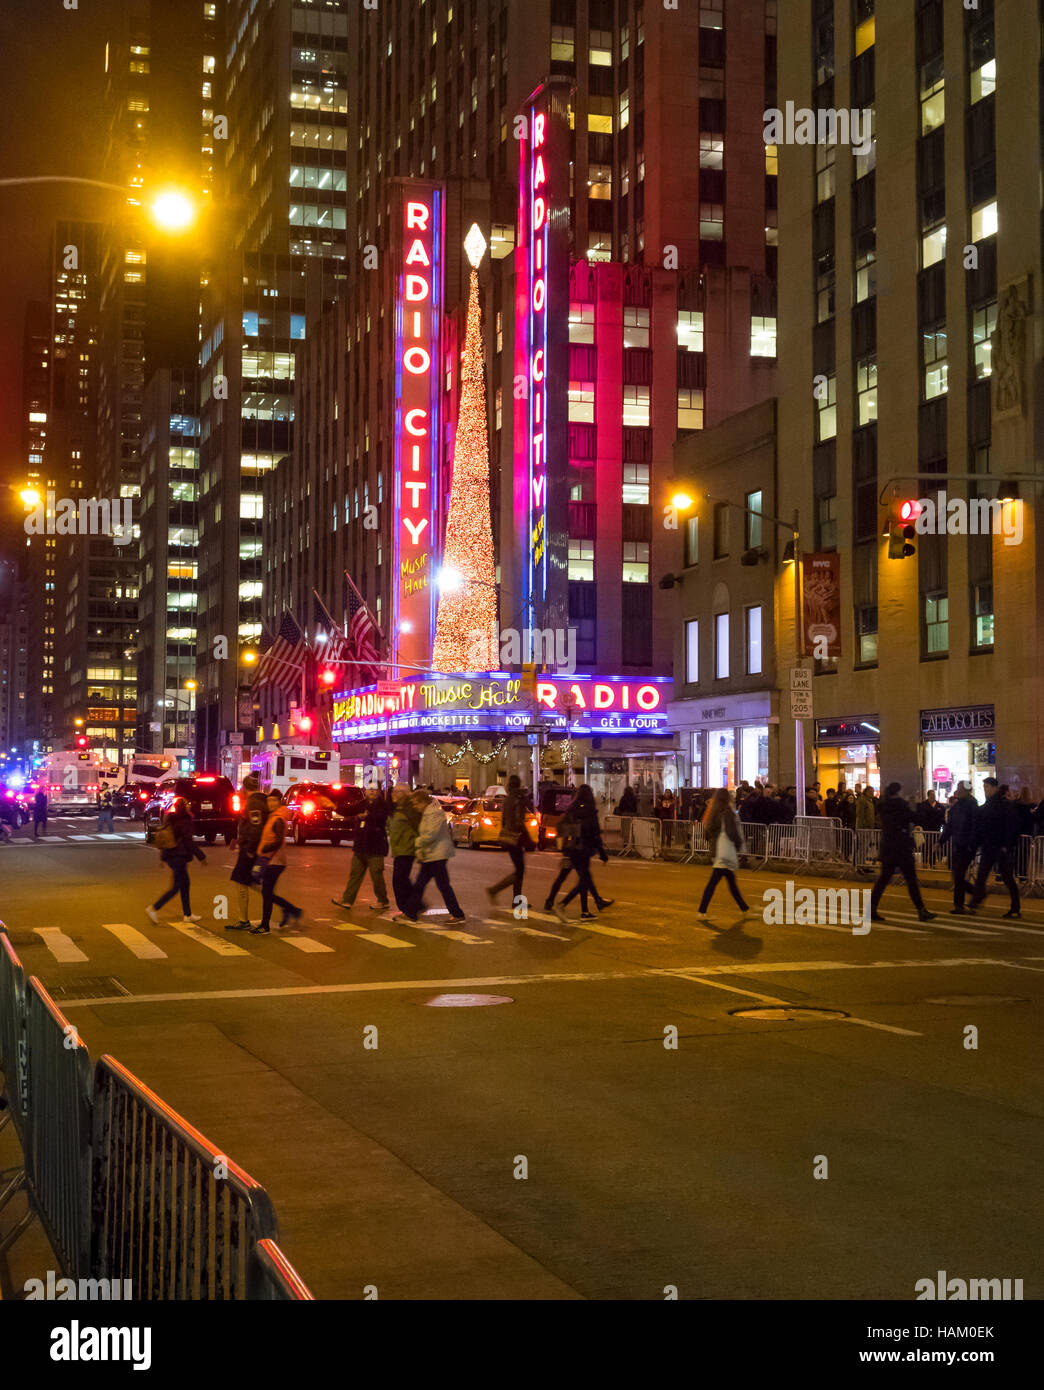 Radio City Music Hall in New York City - Stock Image